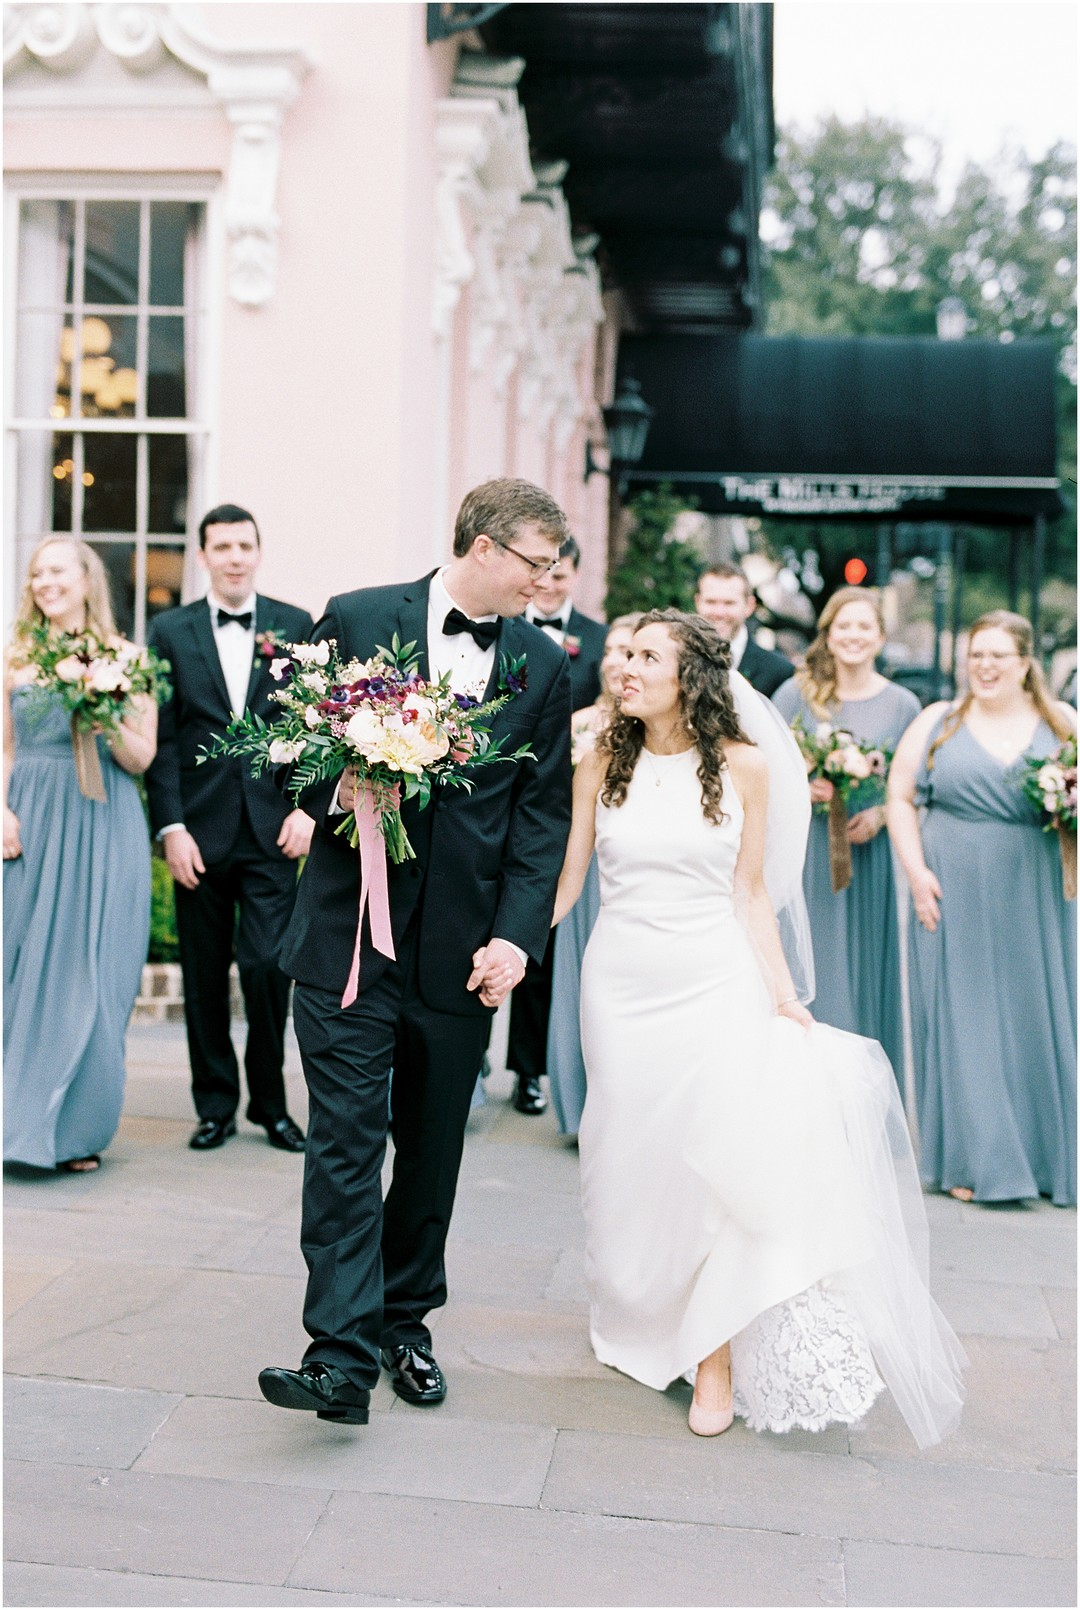 mills-house-hotel-wedding-14.jpg